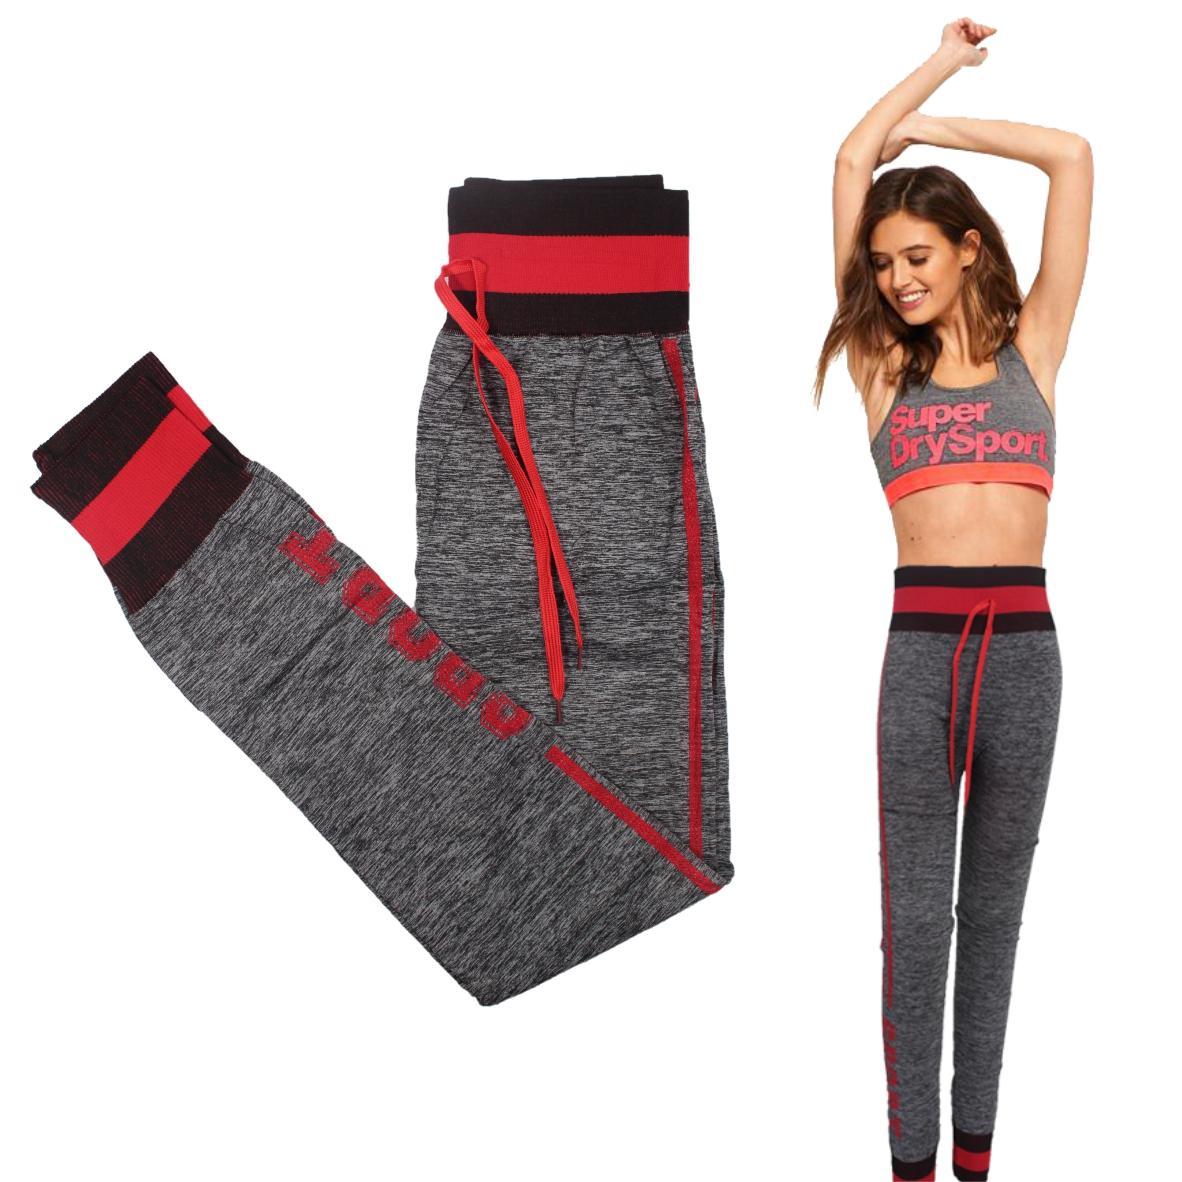 WEITECH Sports Legging   Celana Legging Olahraga Wanita   Celana Yoga    Celana Senam   Celana 41adee89d1